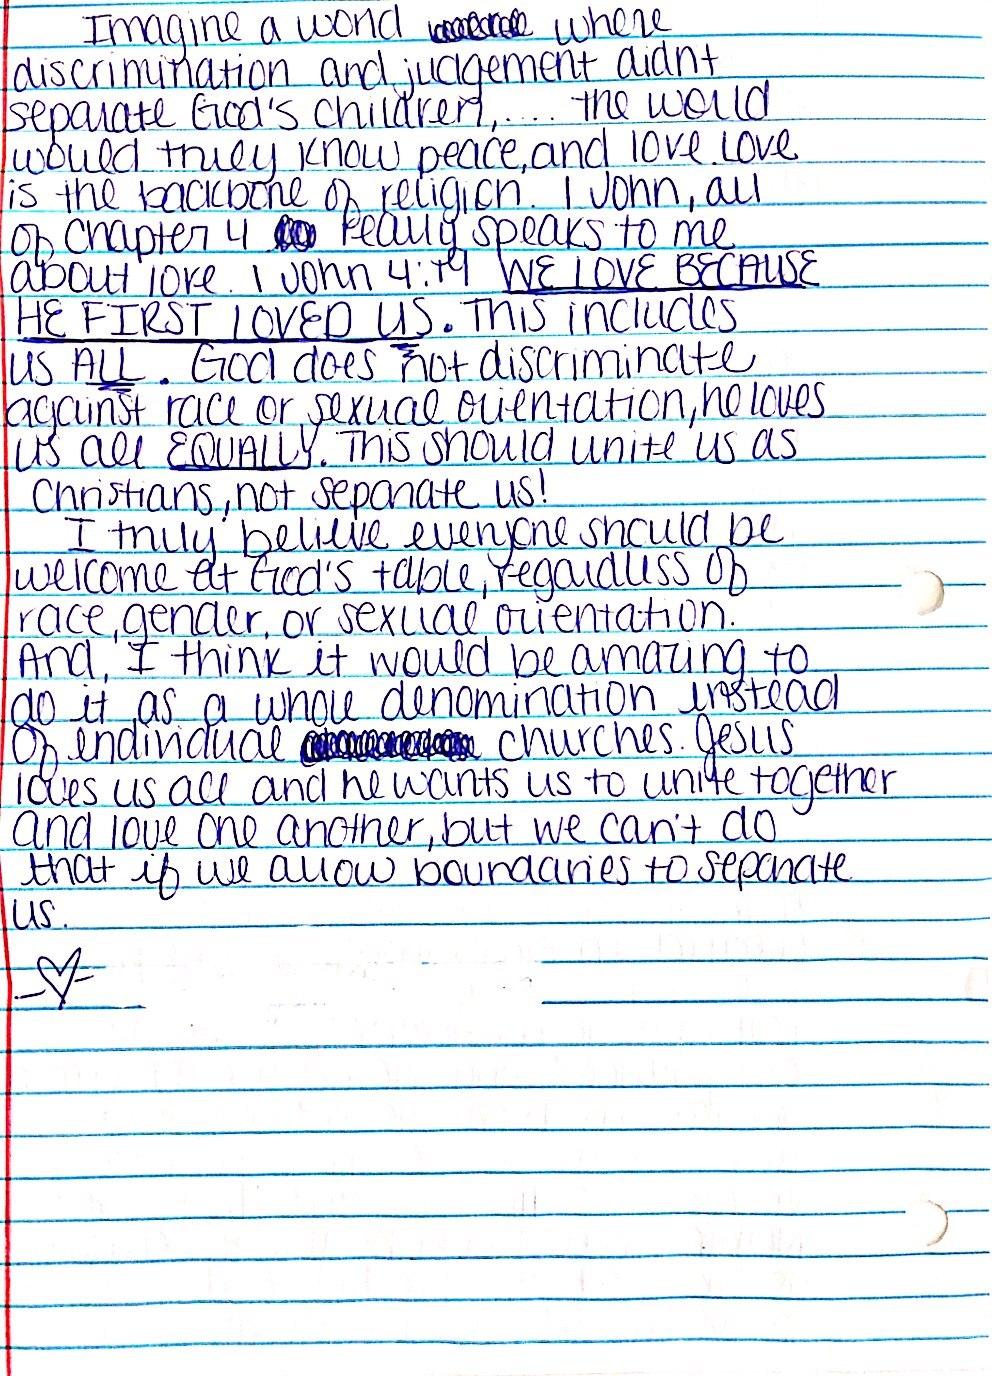 Youth Letter 6 (2).jpg